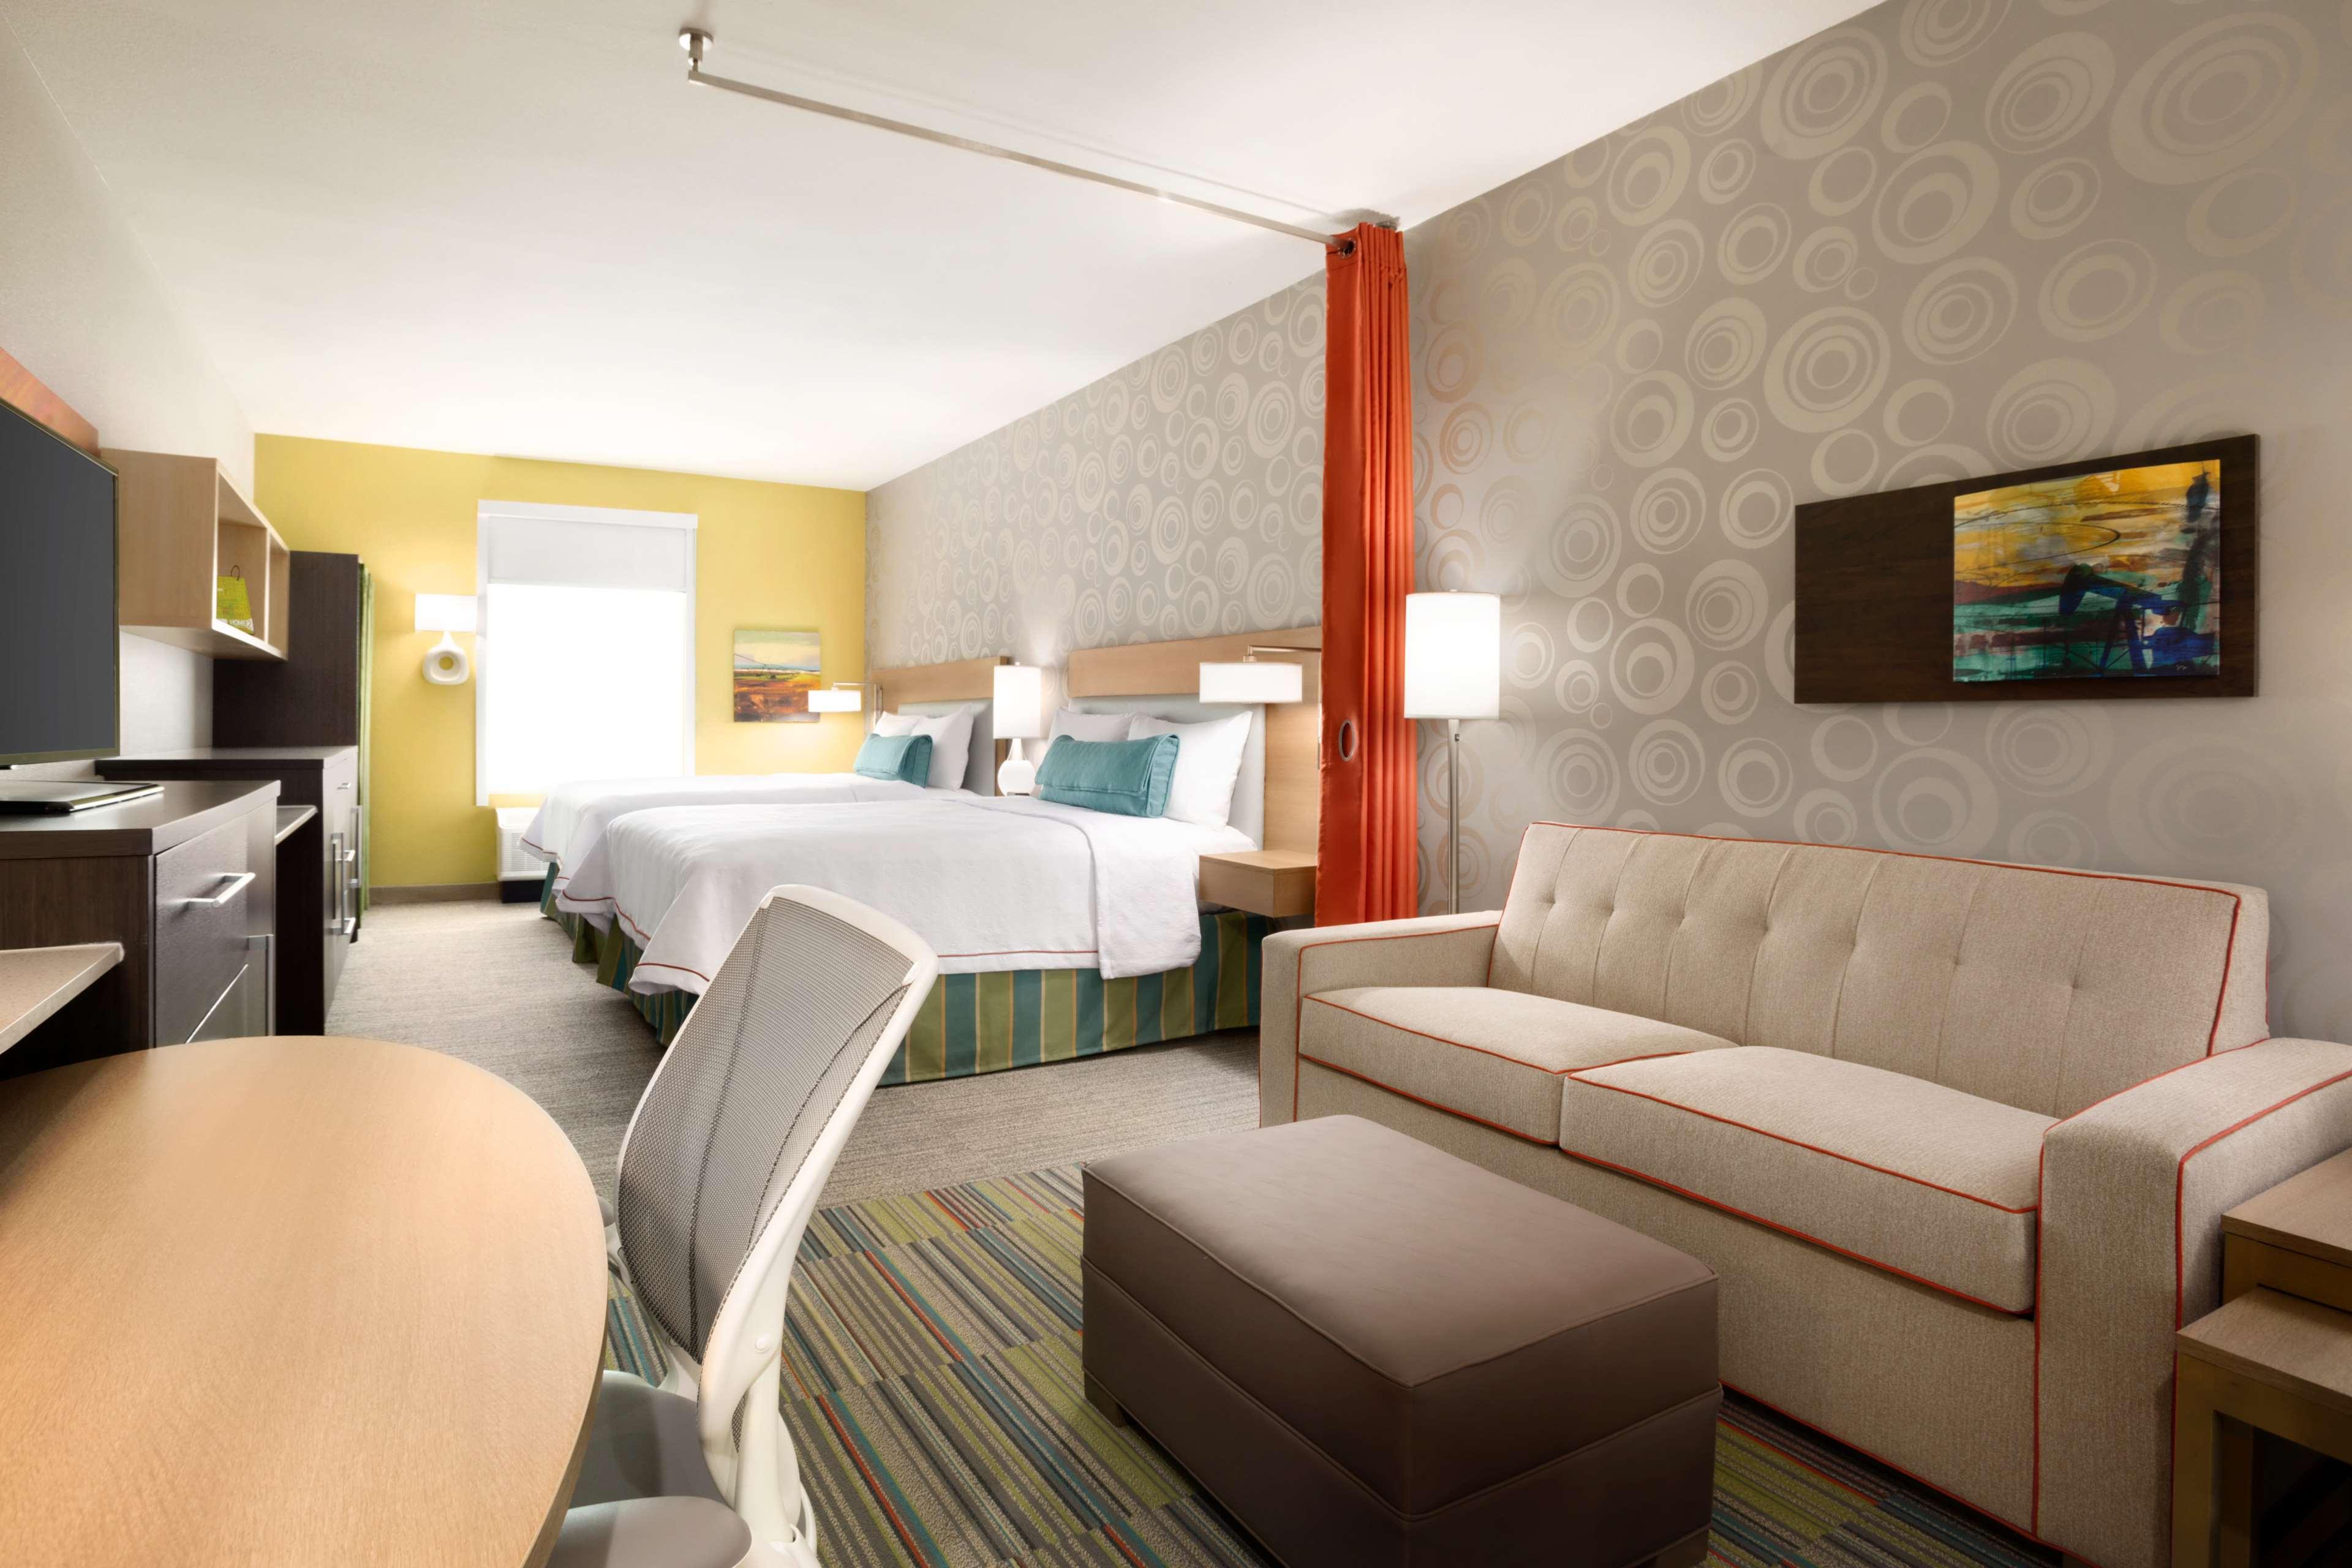 Home2 Suites by Hilton Houston/Webster image 14